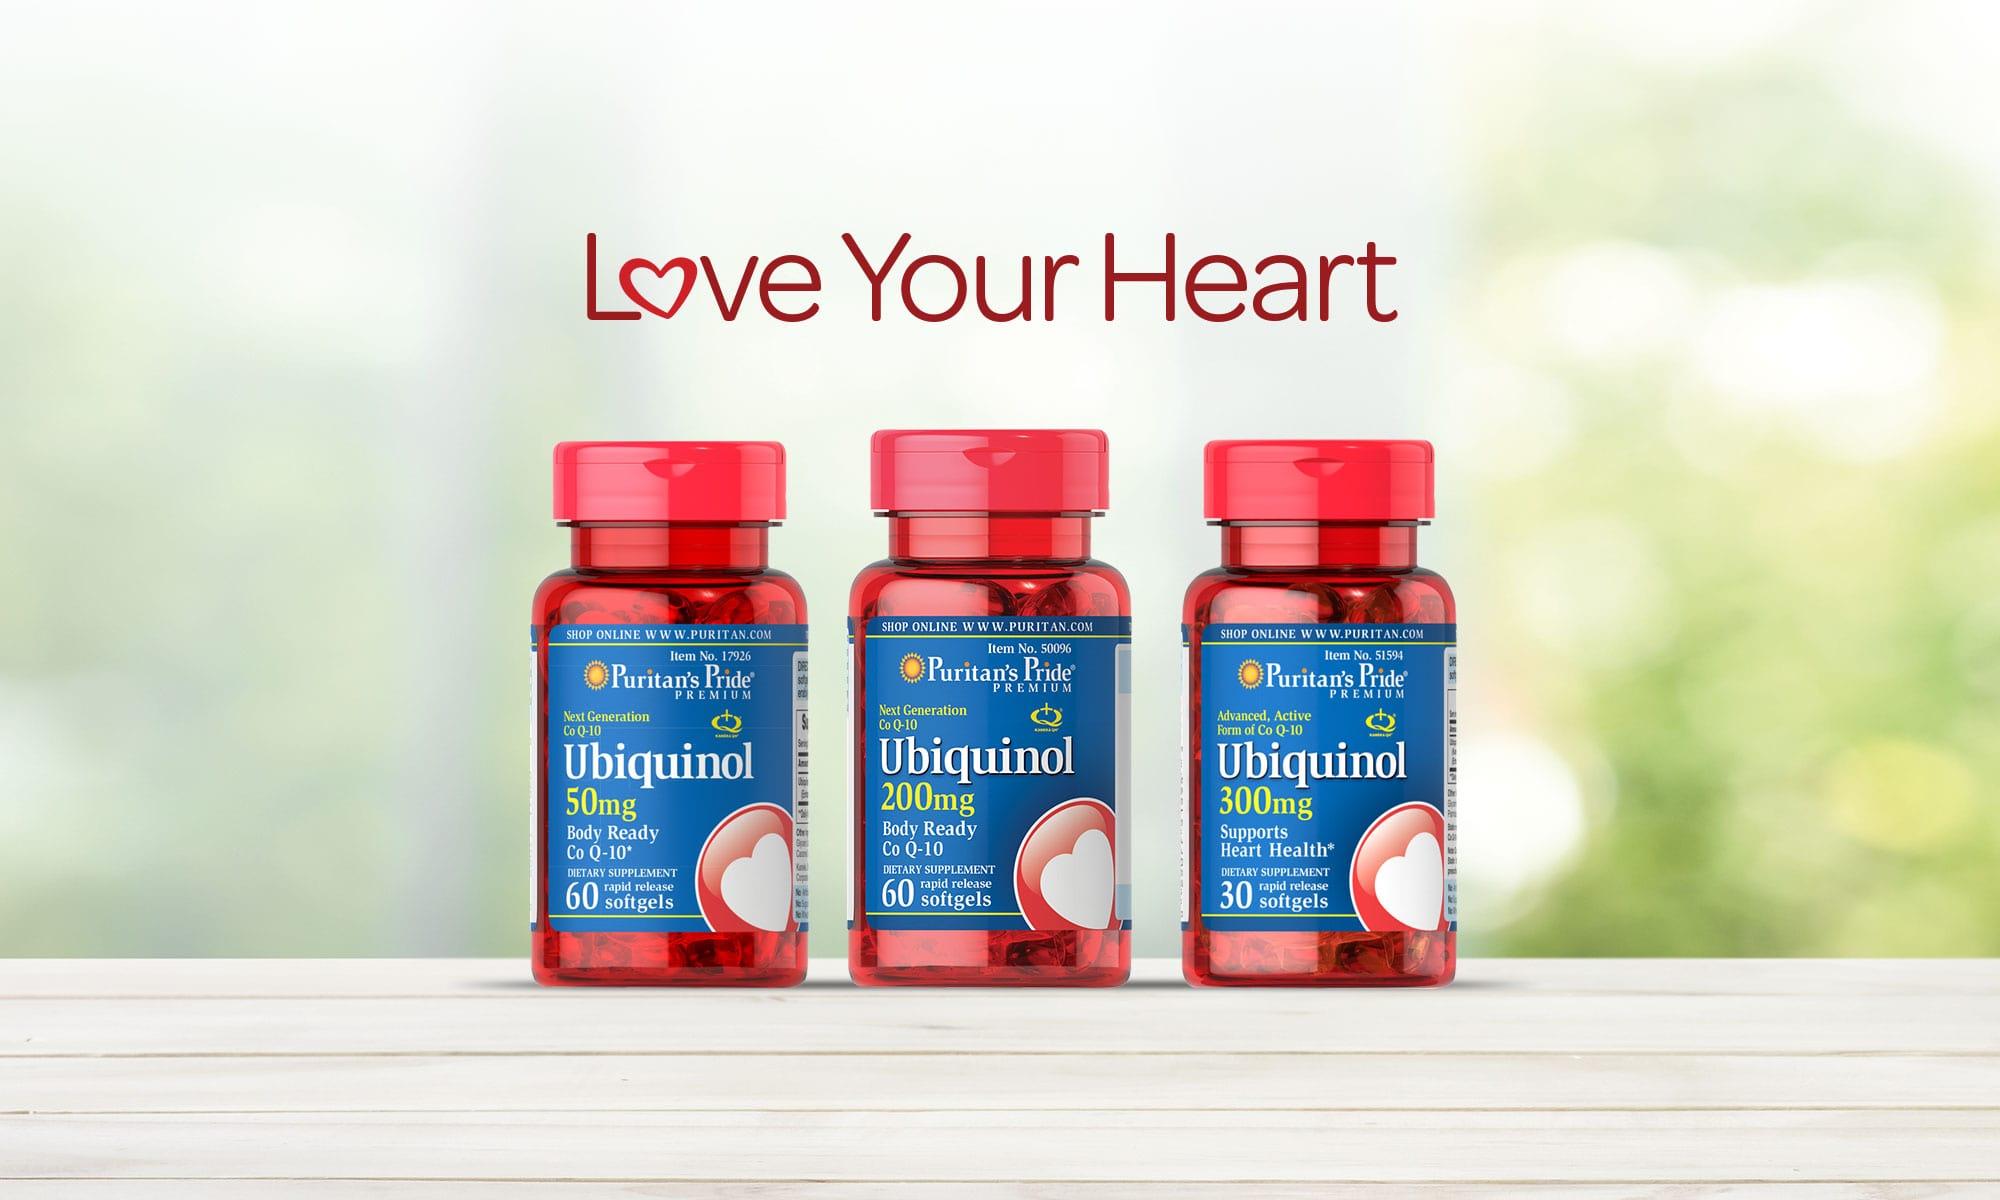 Love Your Heart. Shop All Uiquinol